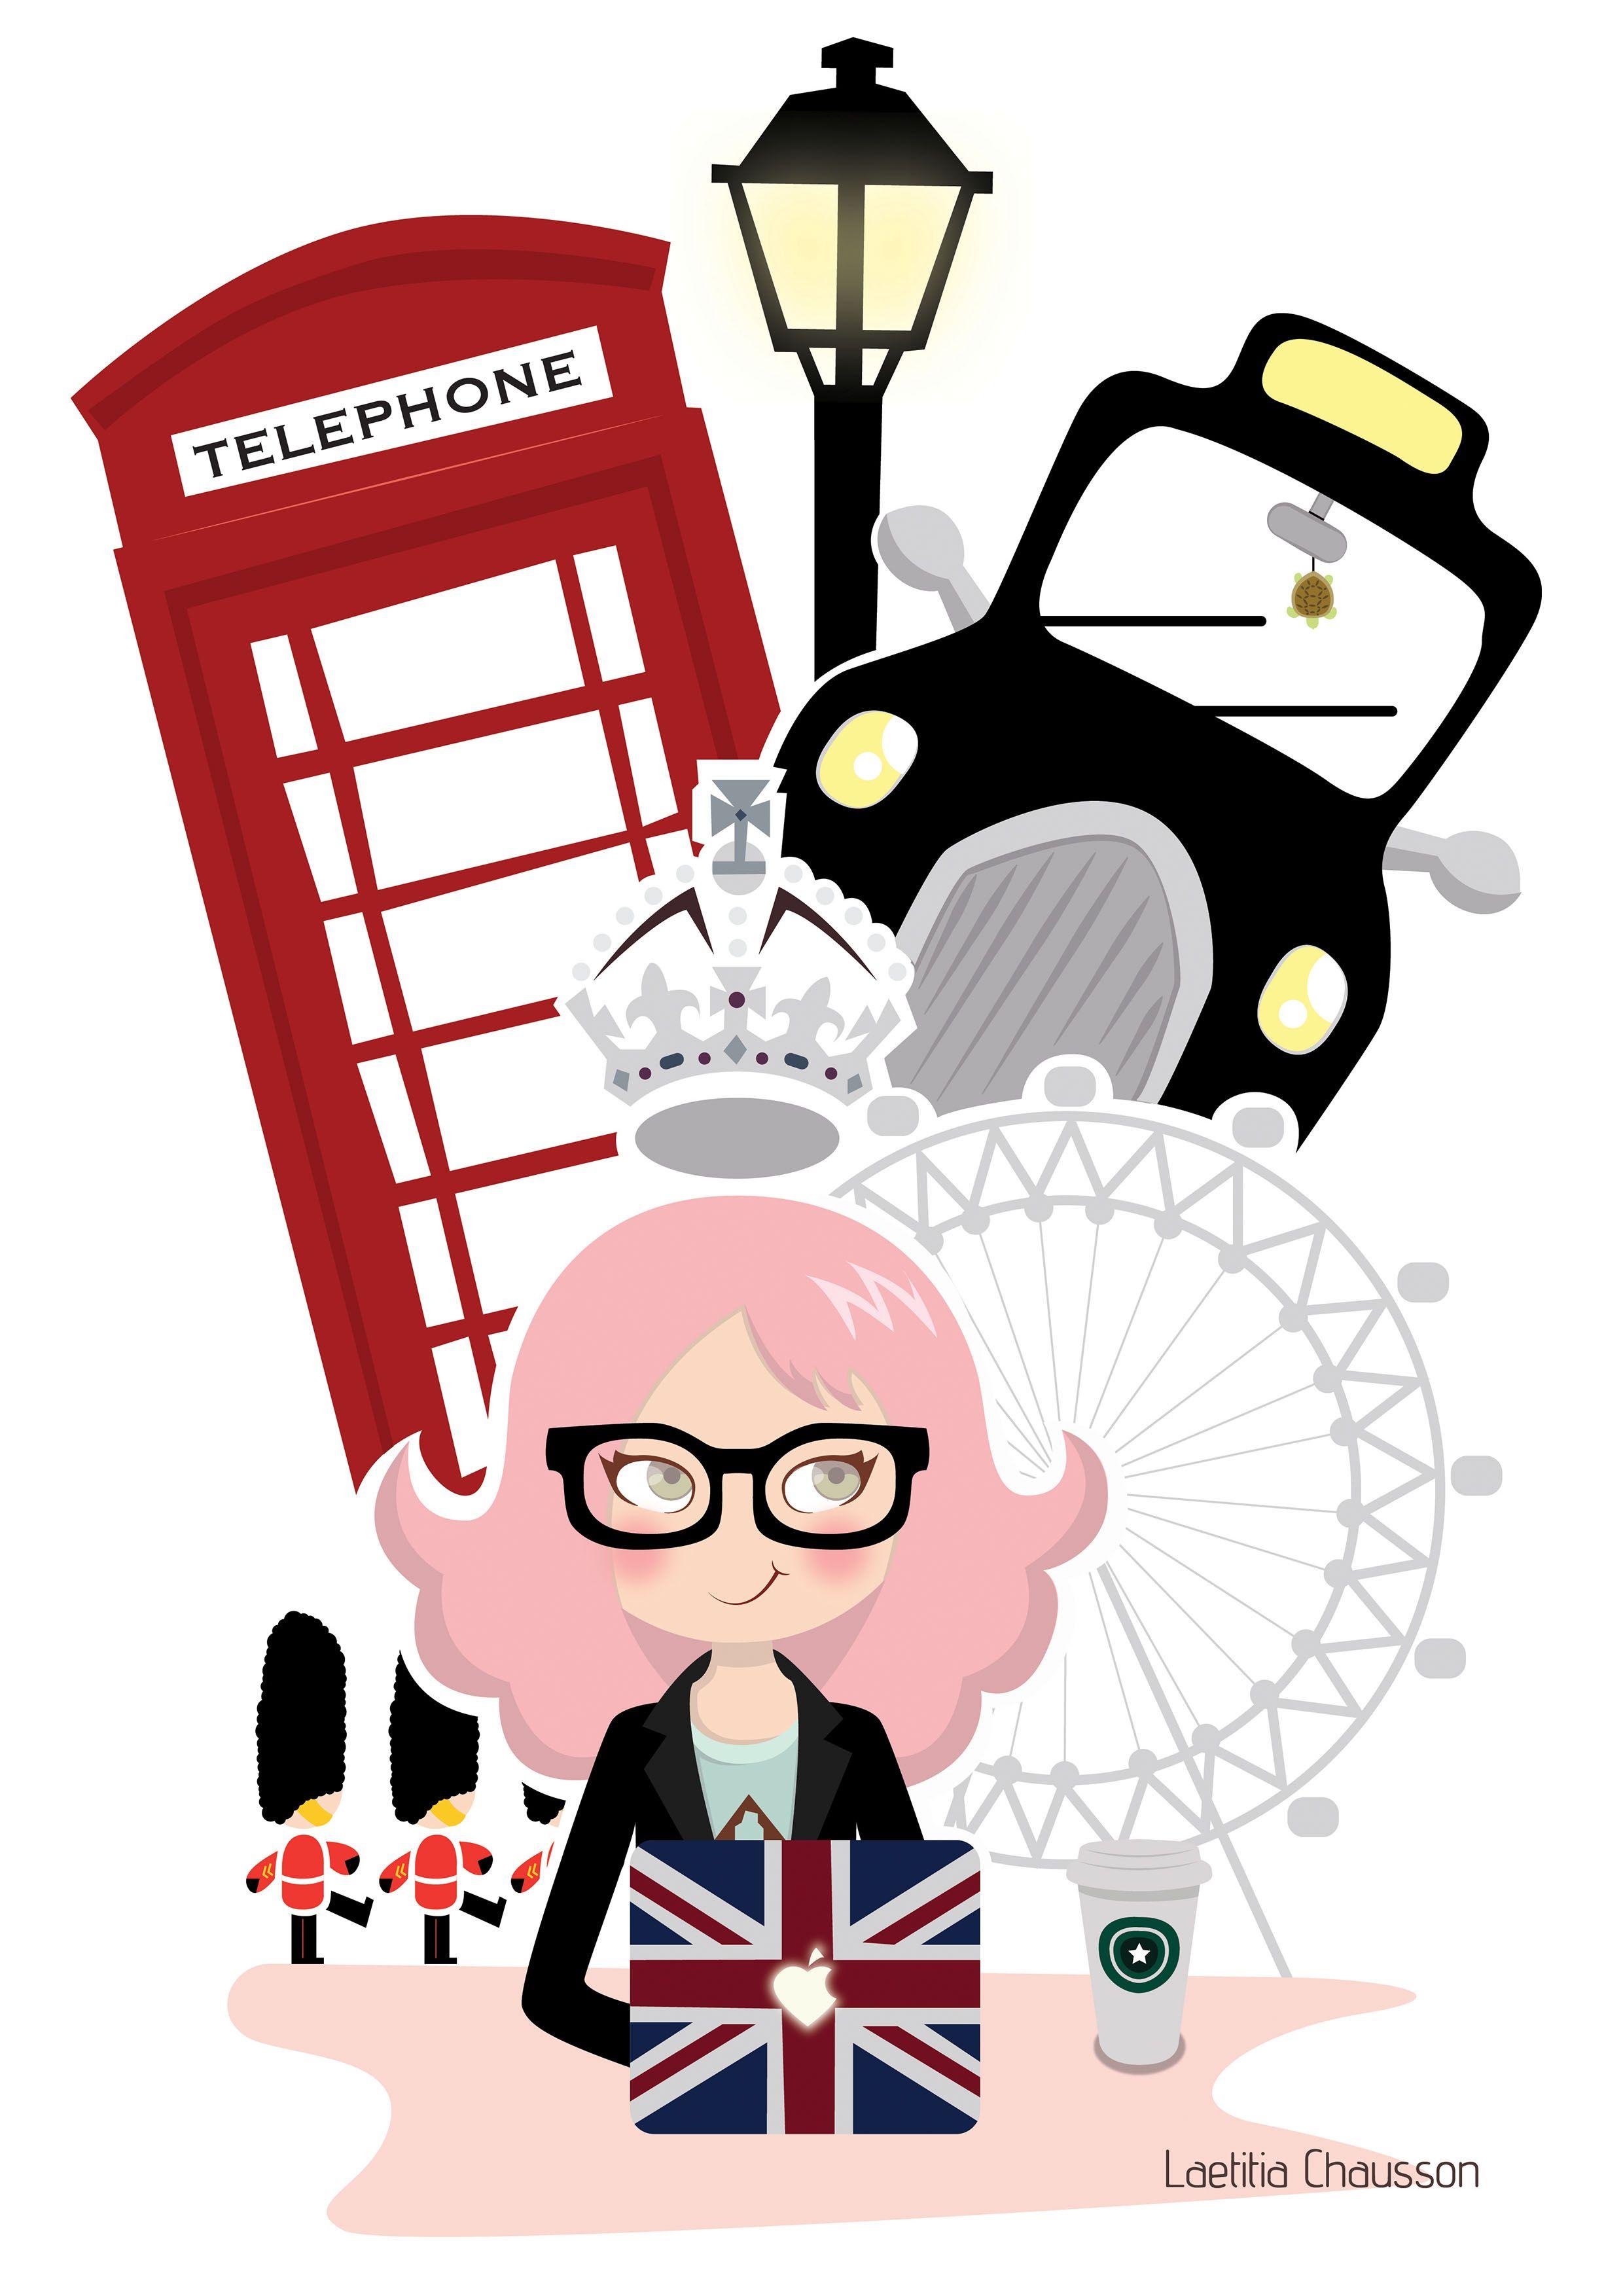 London by Laetitia Chausson